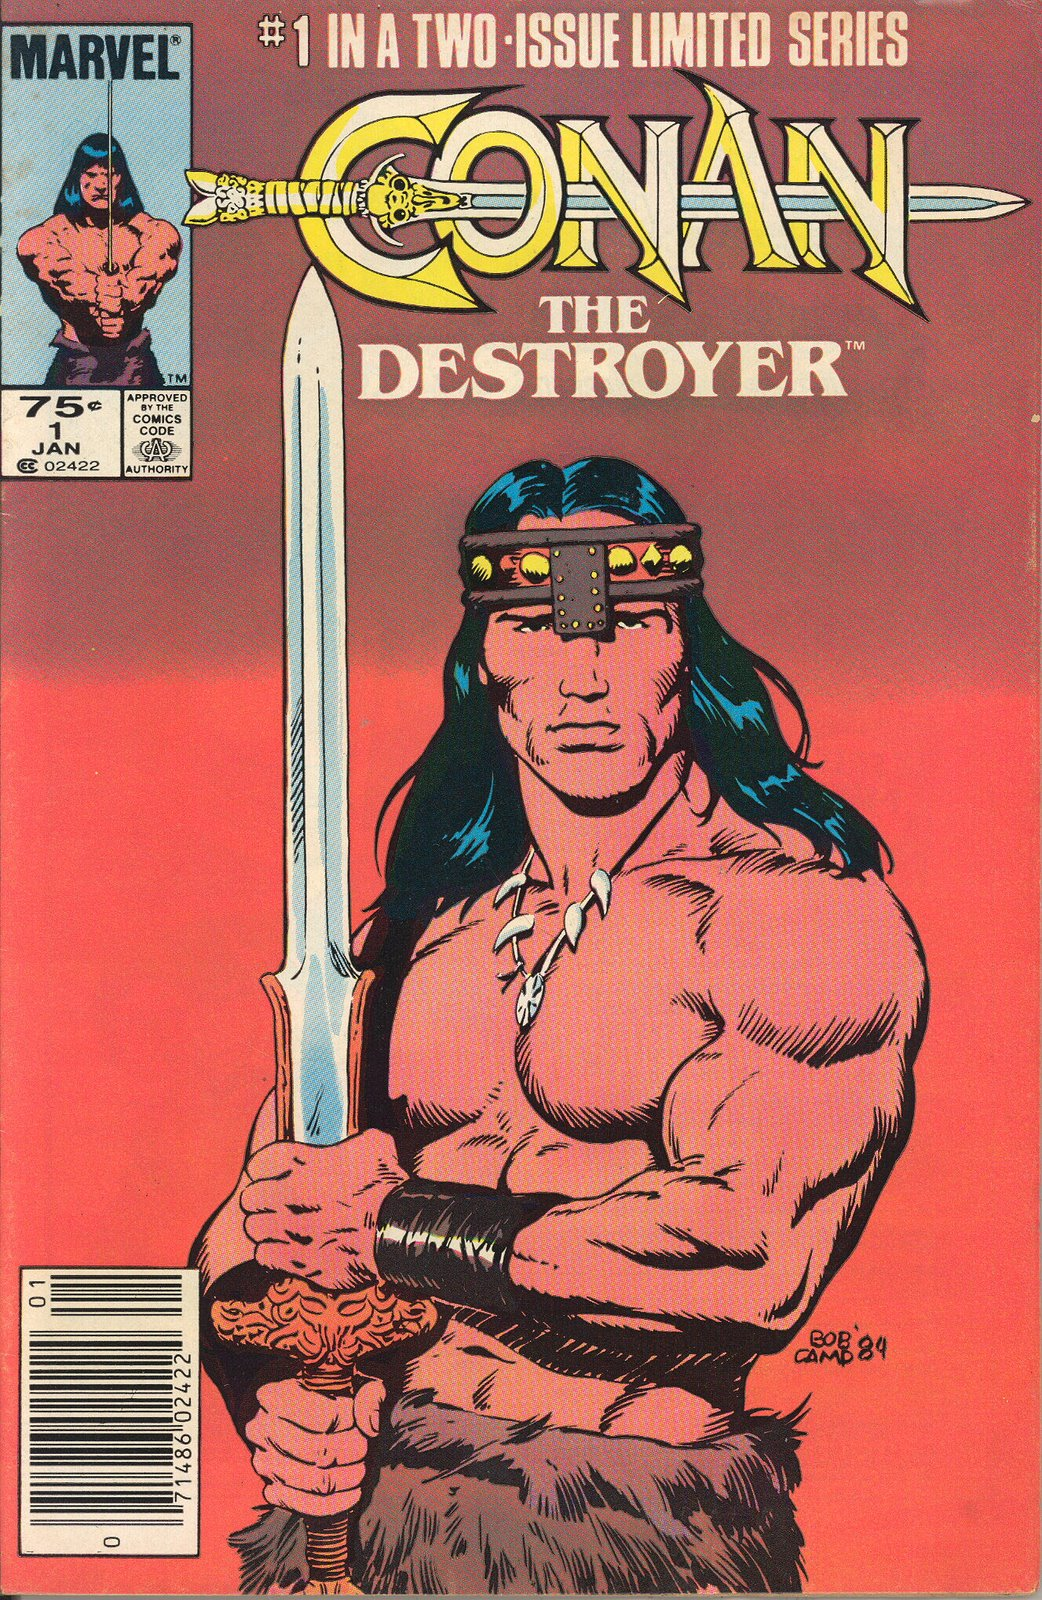 [Conan+the+Destroyer+2]